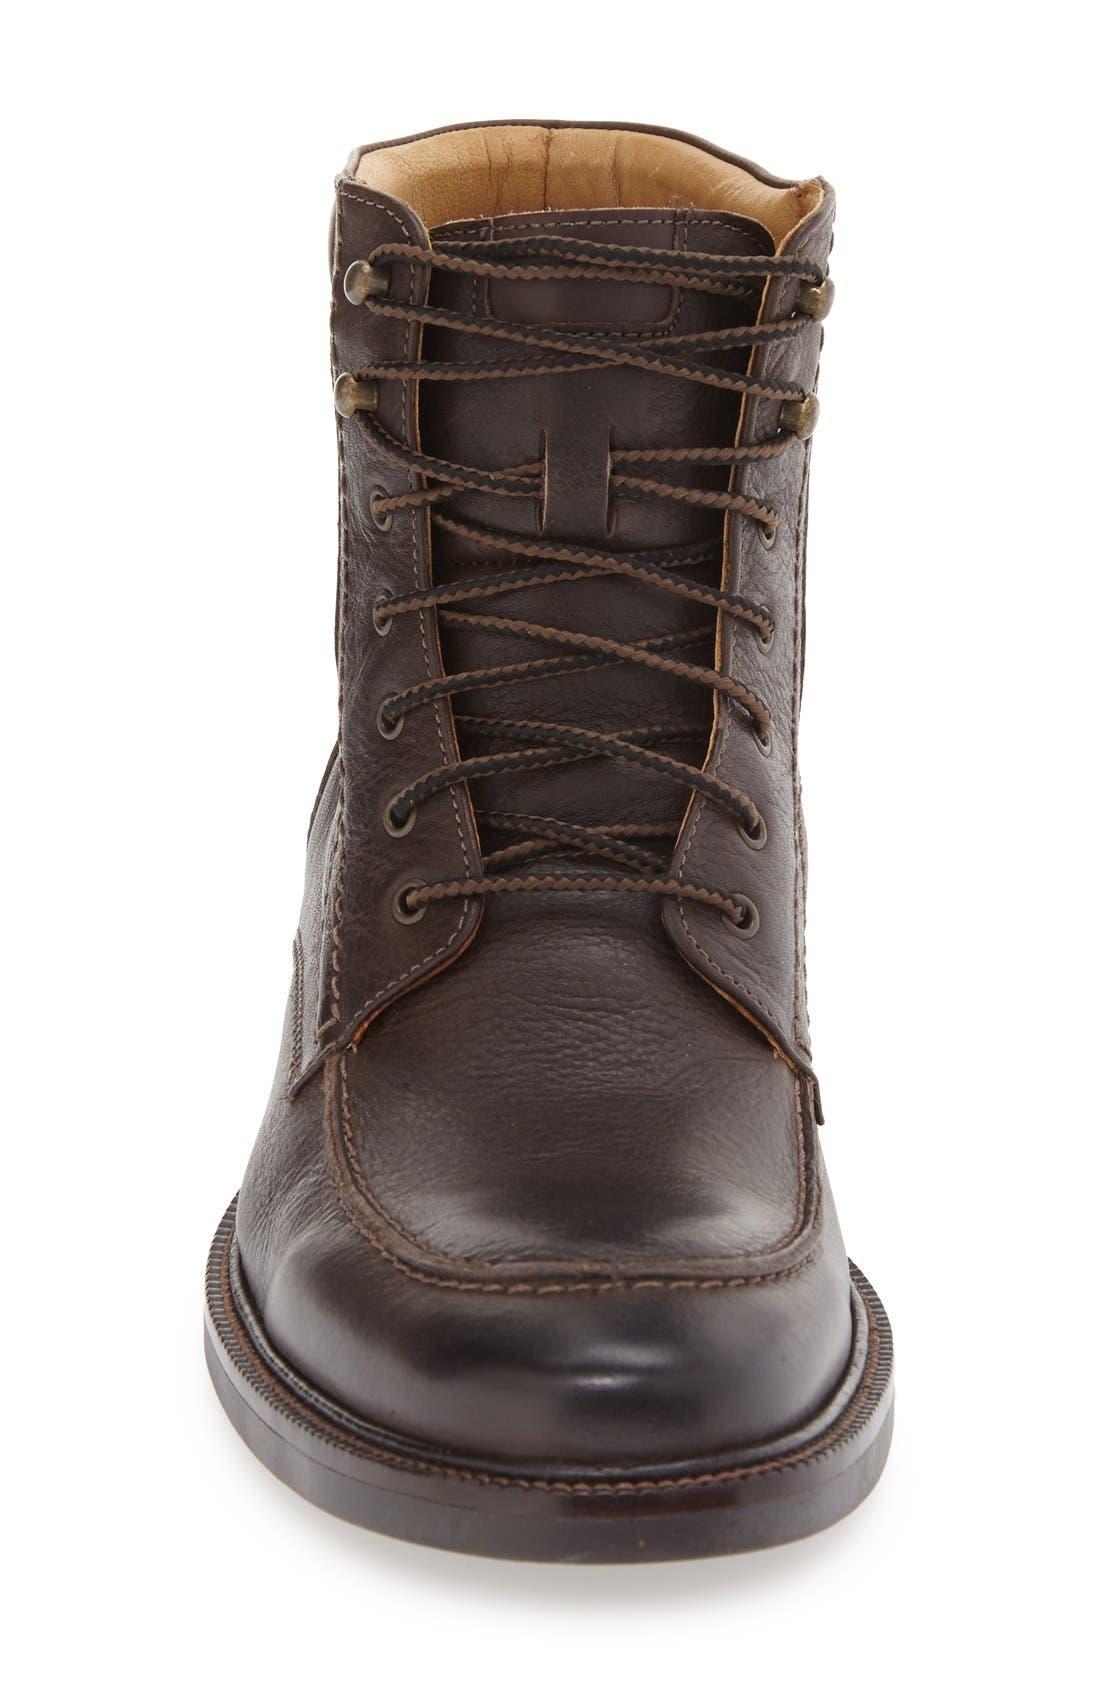 'Baird' Moc Toe Boot,                             Alternate thumbnail 3, color,                             Brown